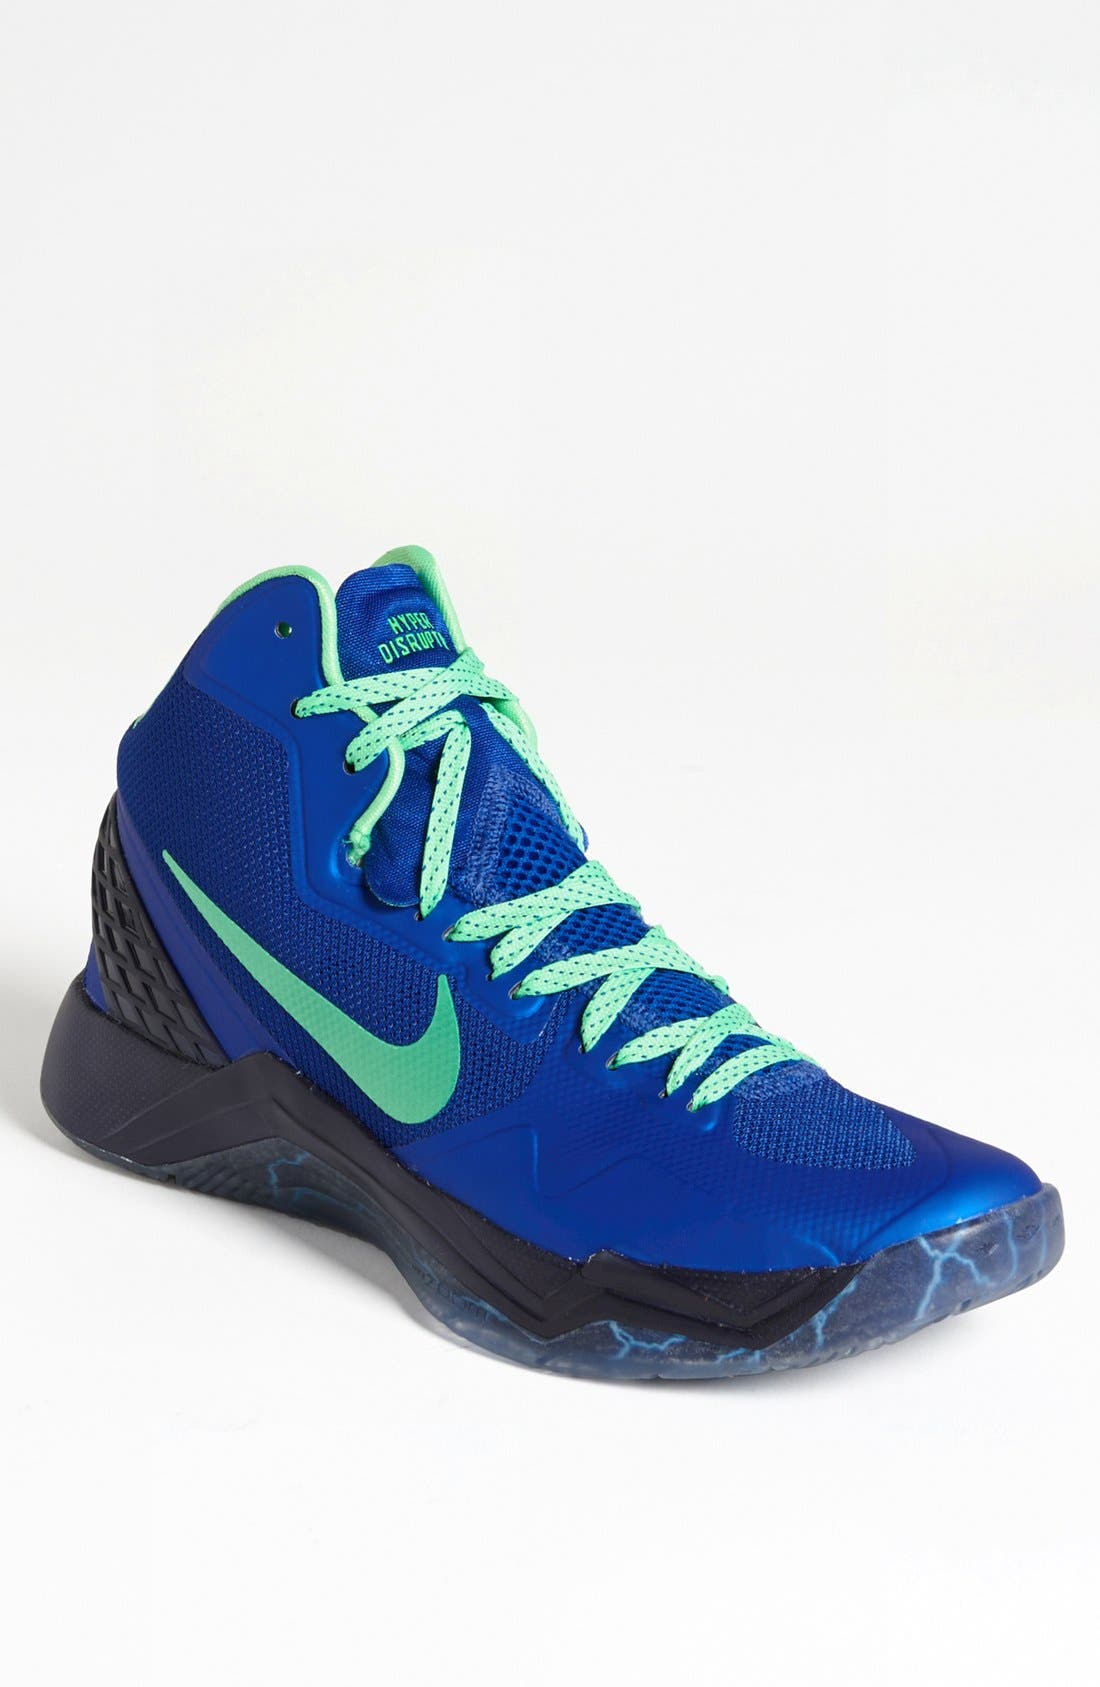 Alternate Image 1 Selected - Nike 'Zoom Hyperdisruptor' Basketball Shoe (Men)